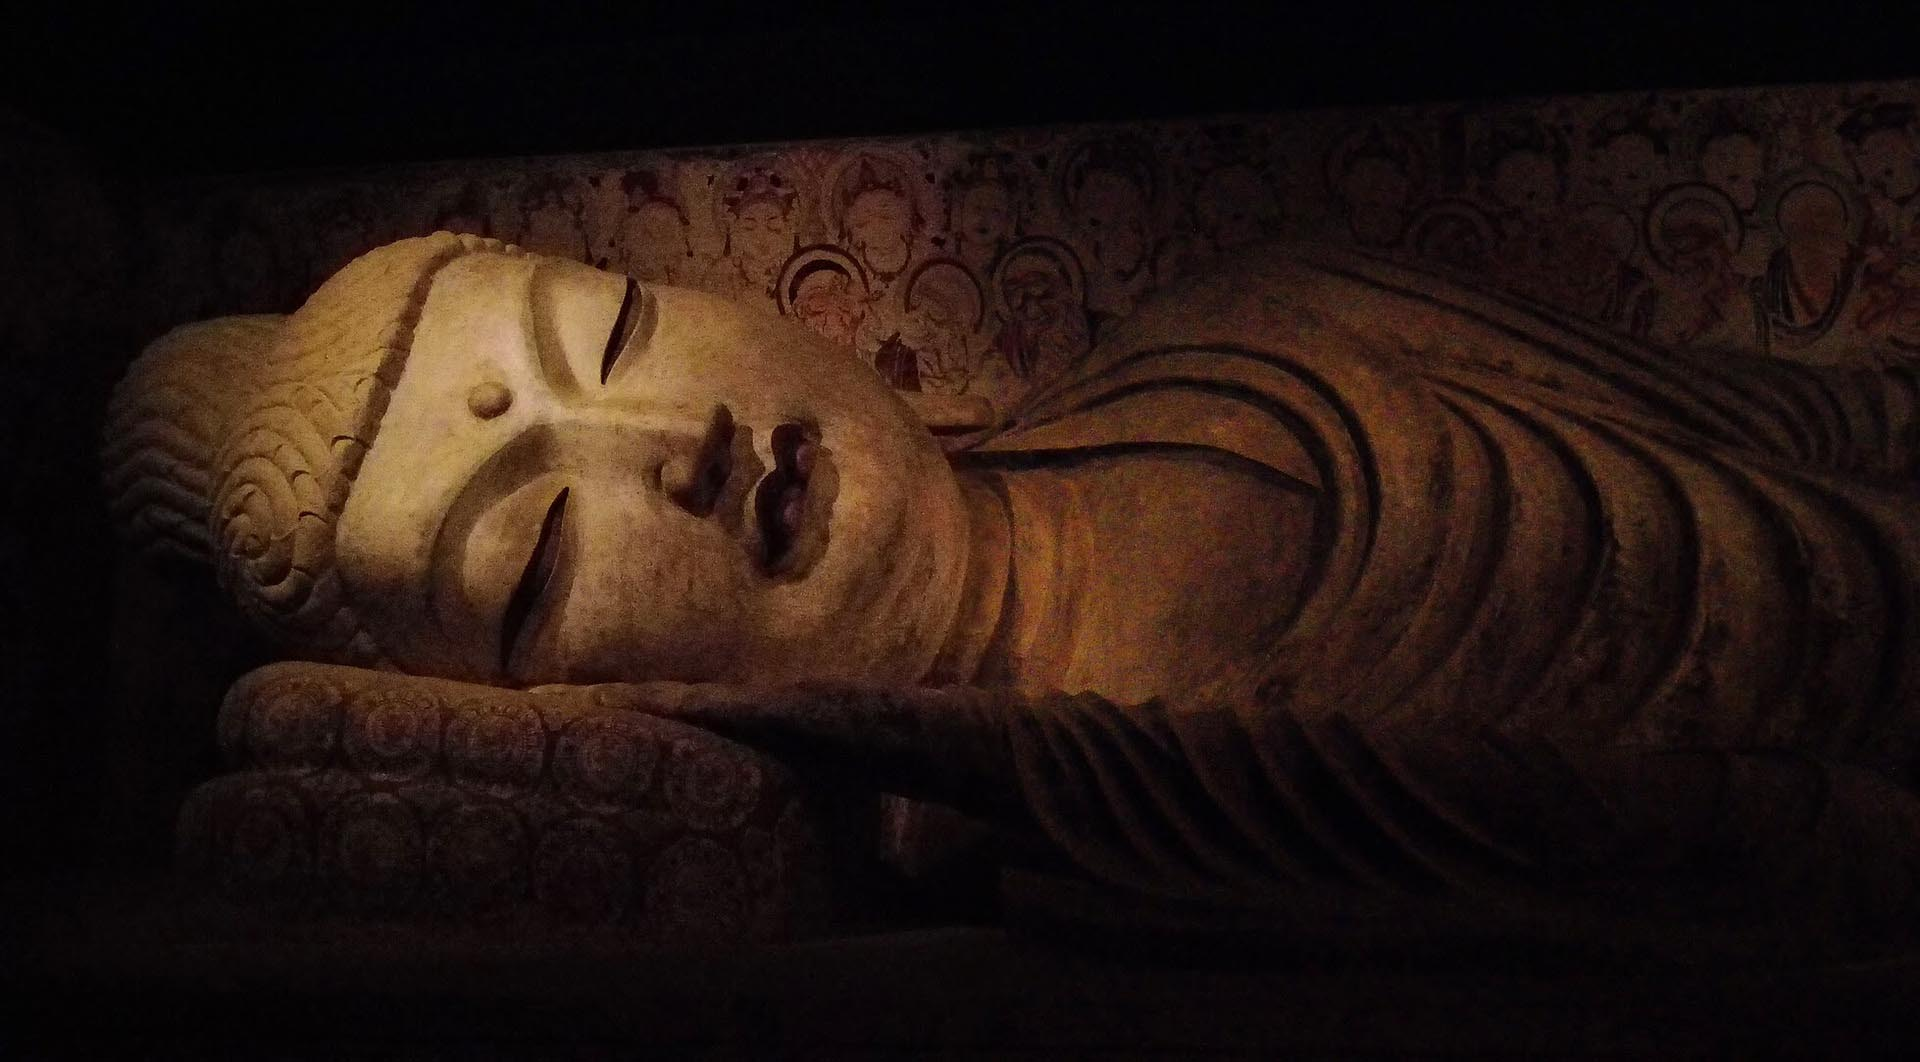 Buda Parinirvana - Life of the Buddha